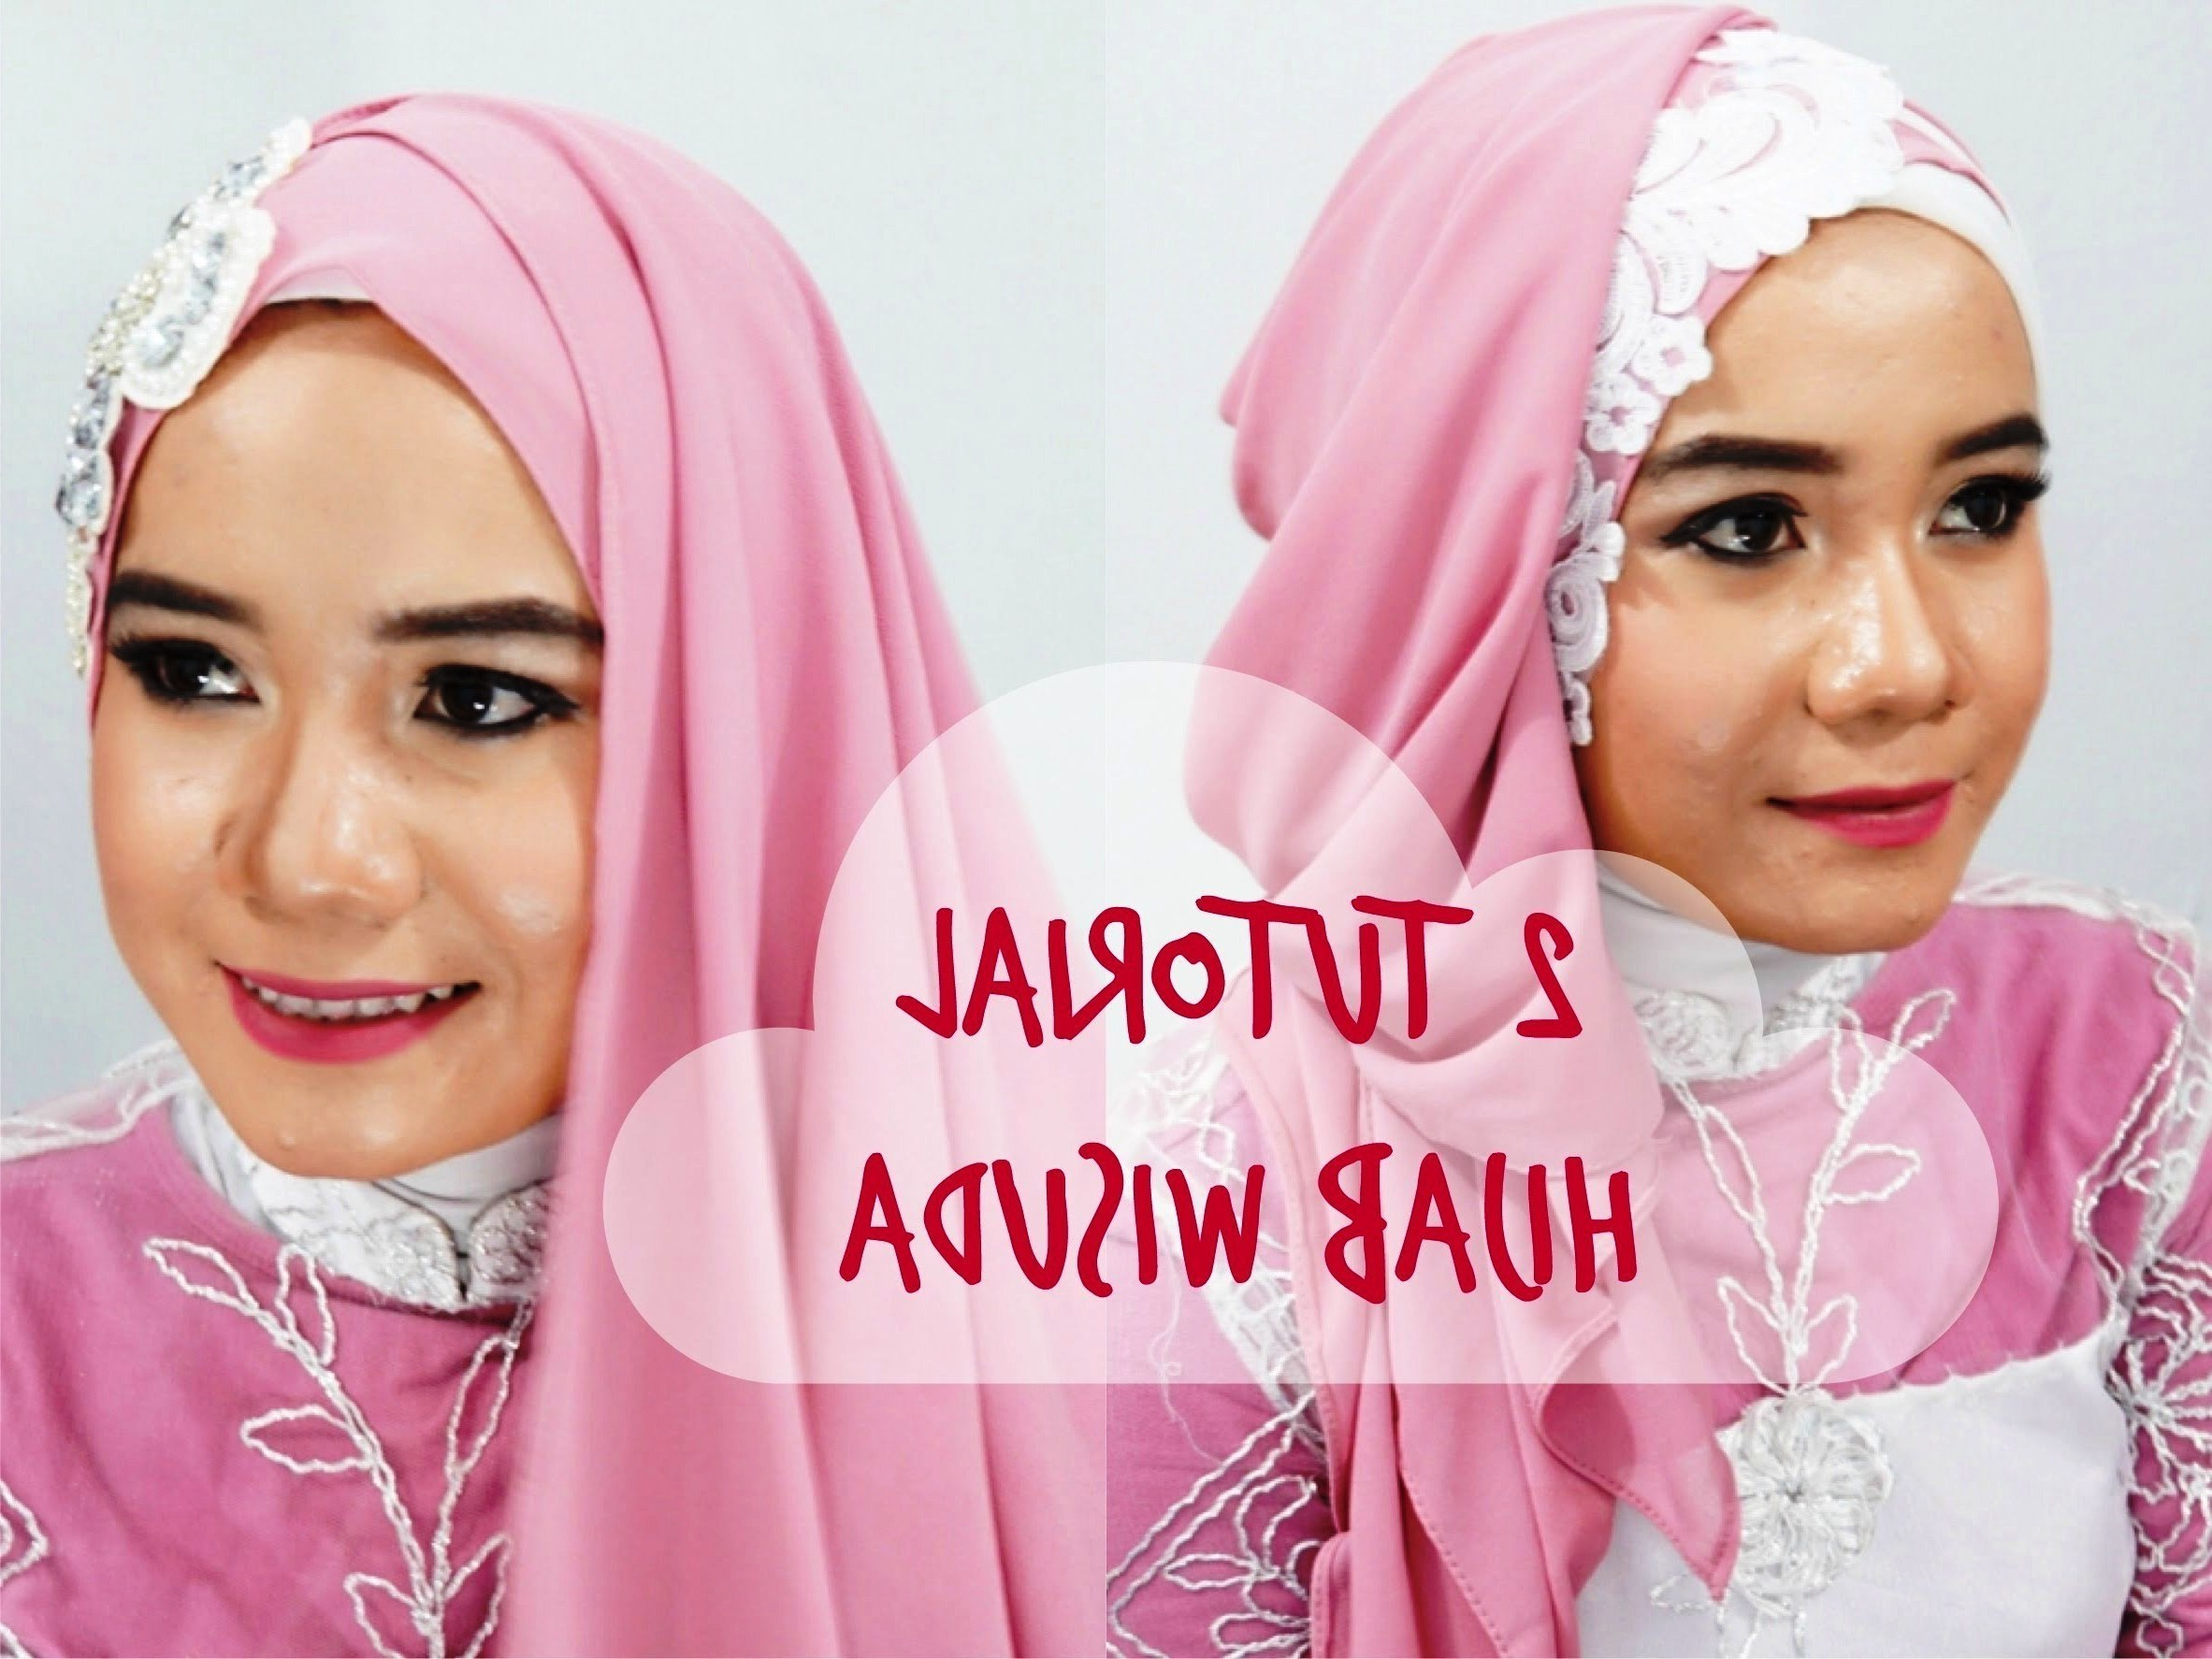 Design Gaun Pengantin Muslim Cantik Qwdq Foto Wanita Bercadar Modern Cantik Gaun Pengantin Muslimah